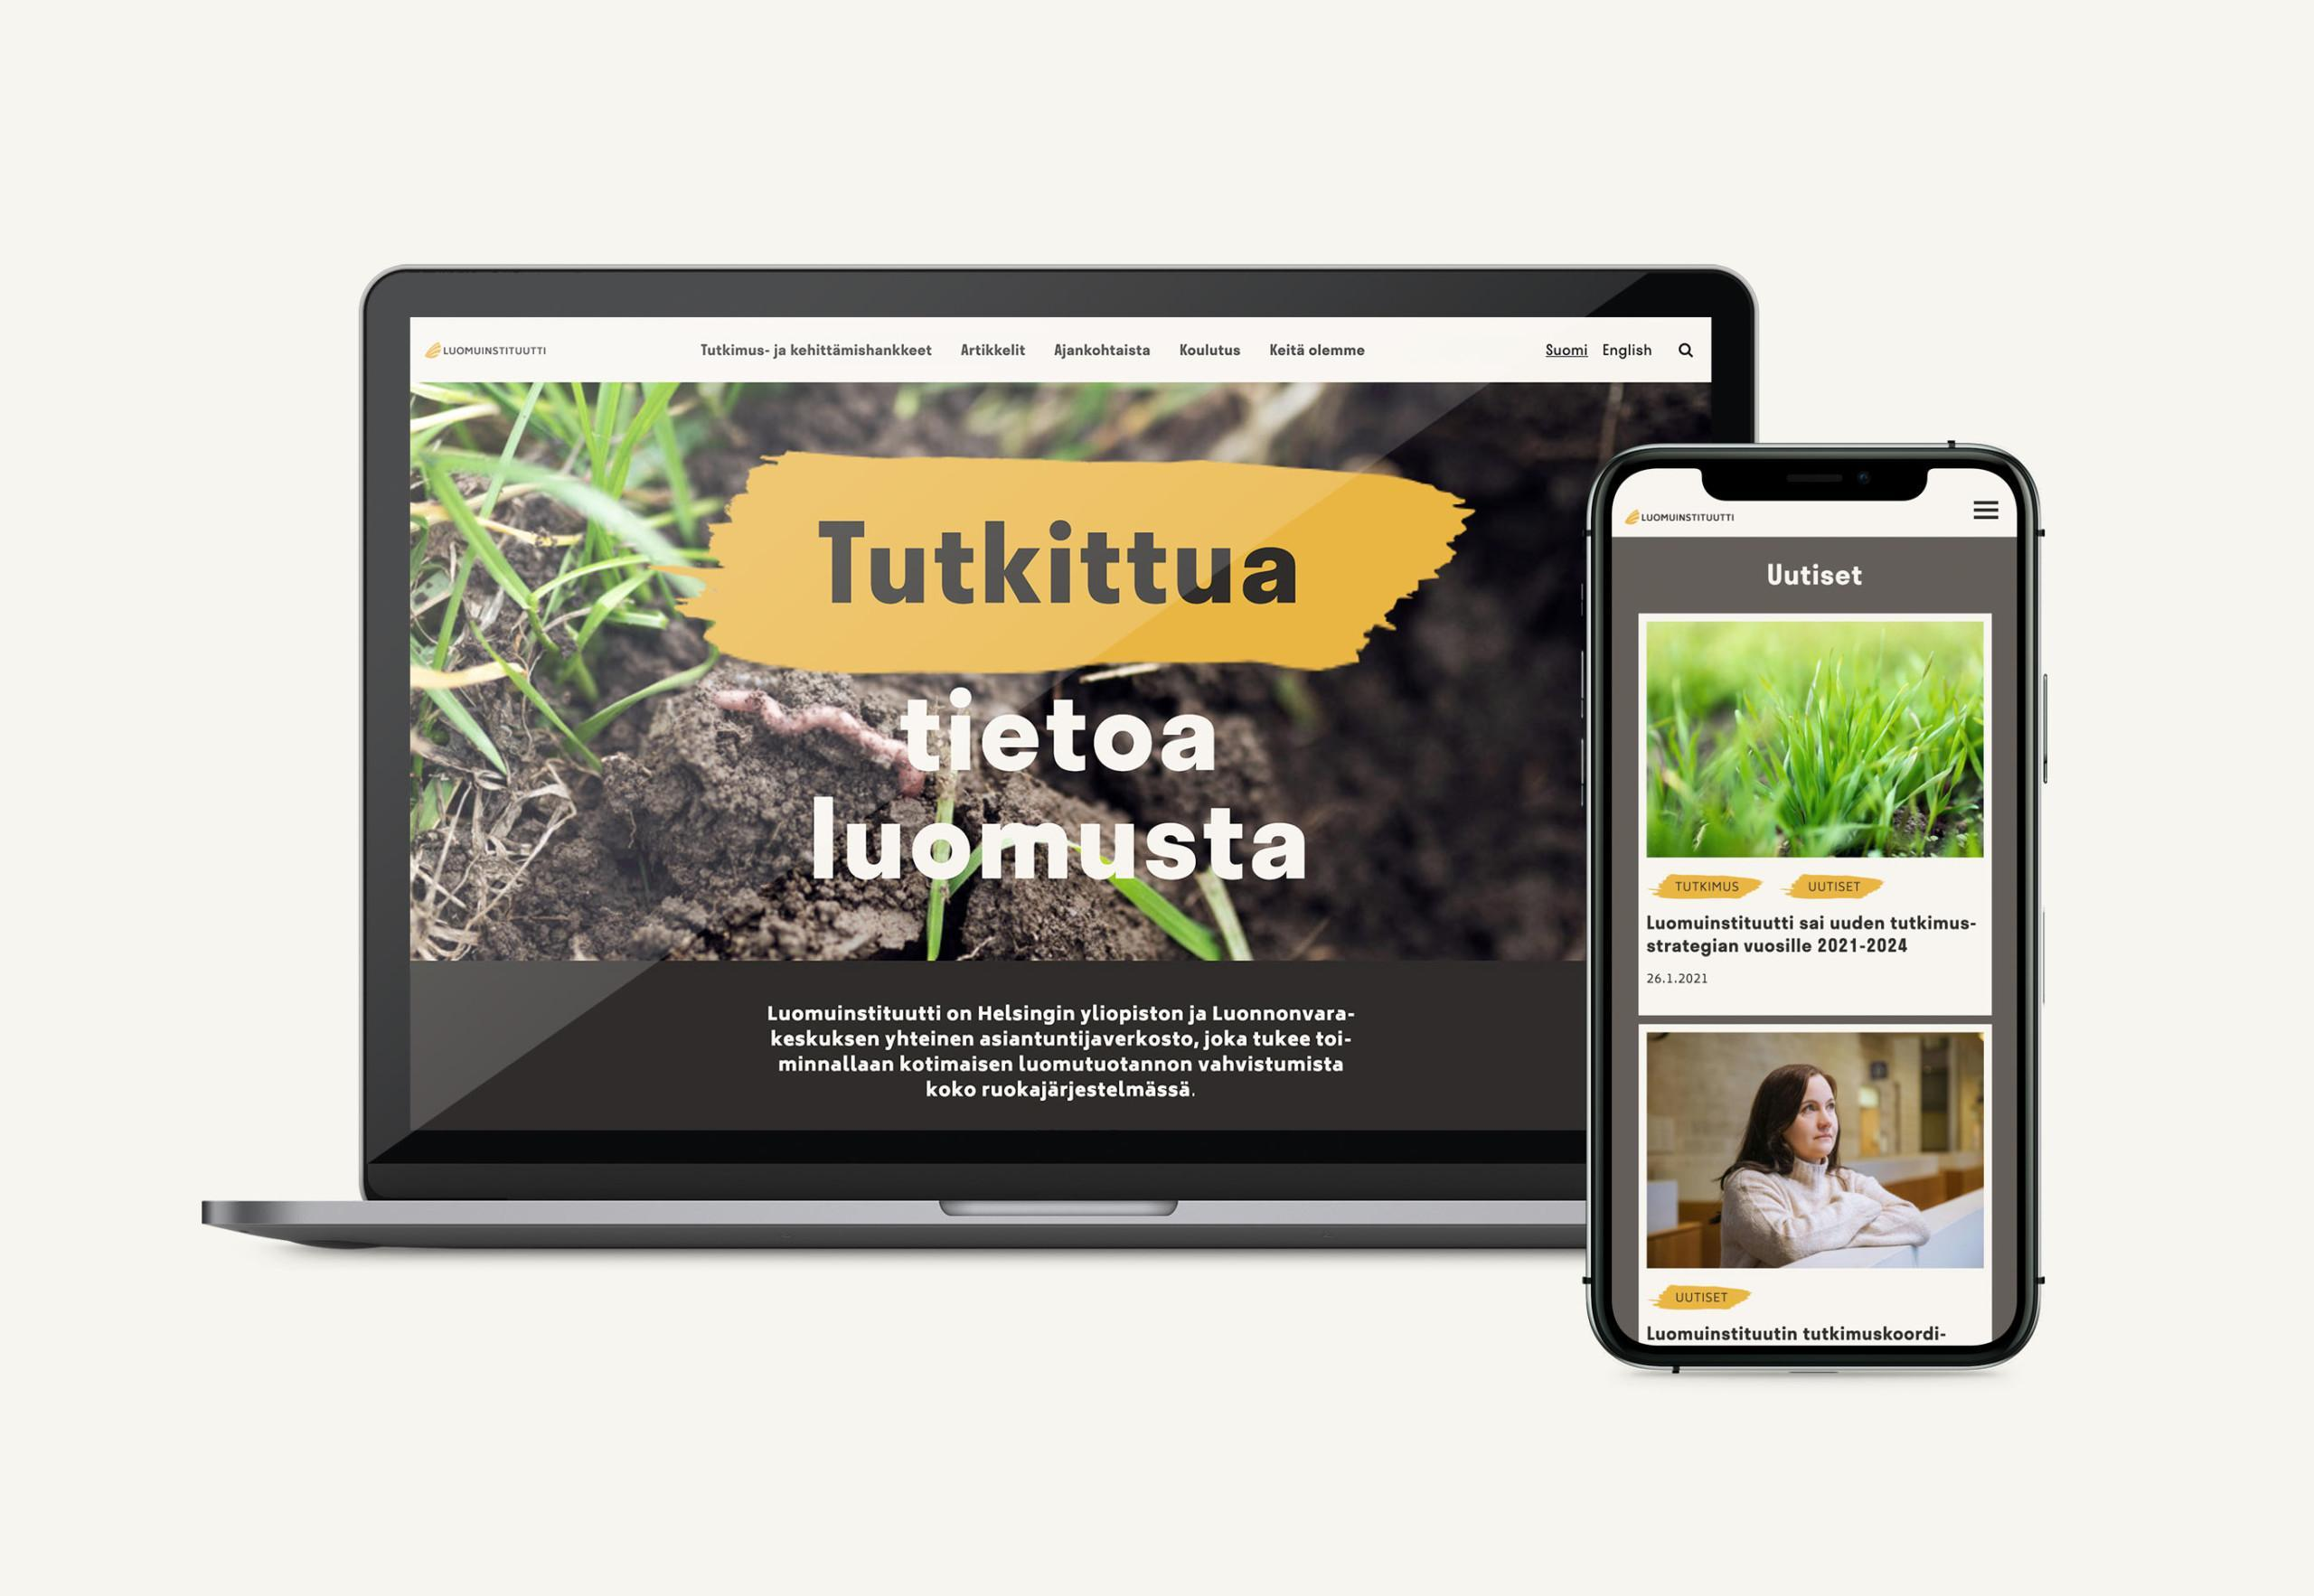 luomuinstituutti.fi